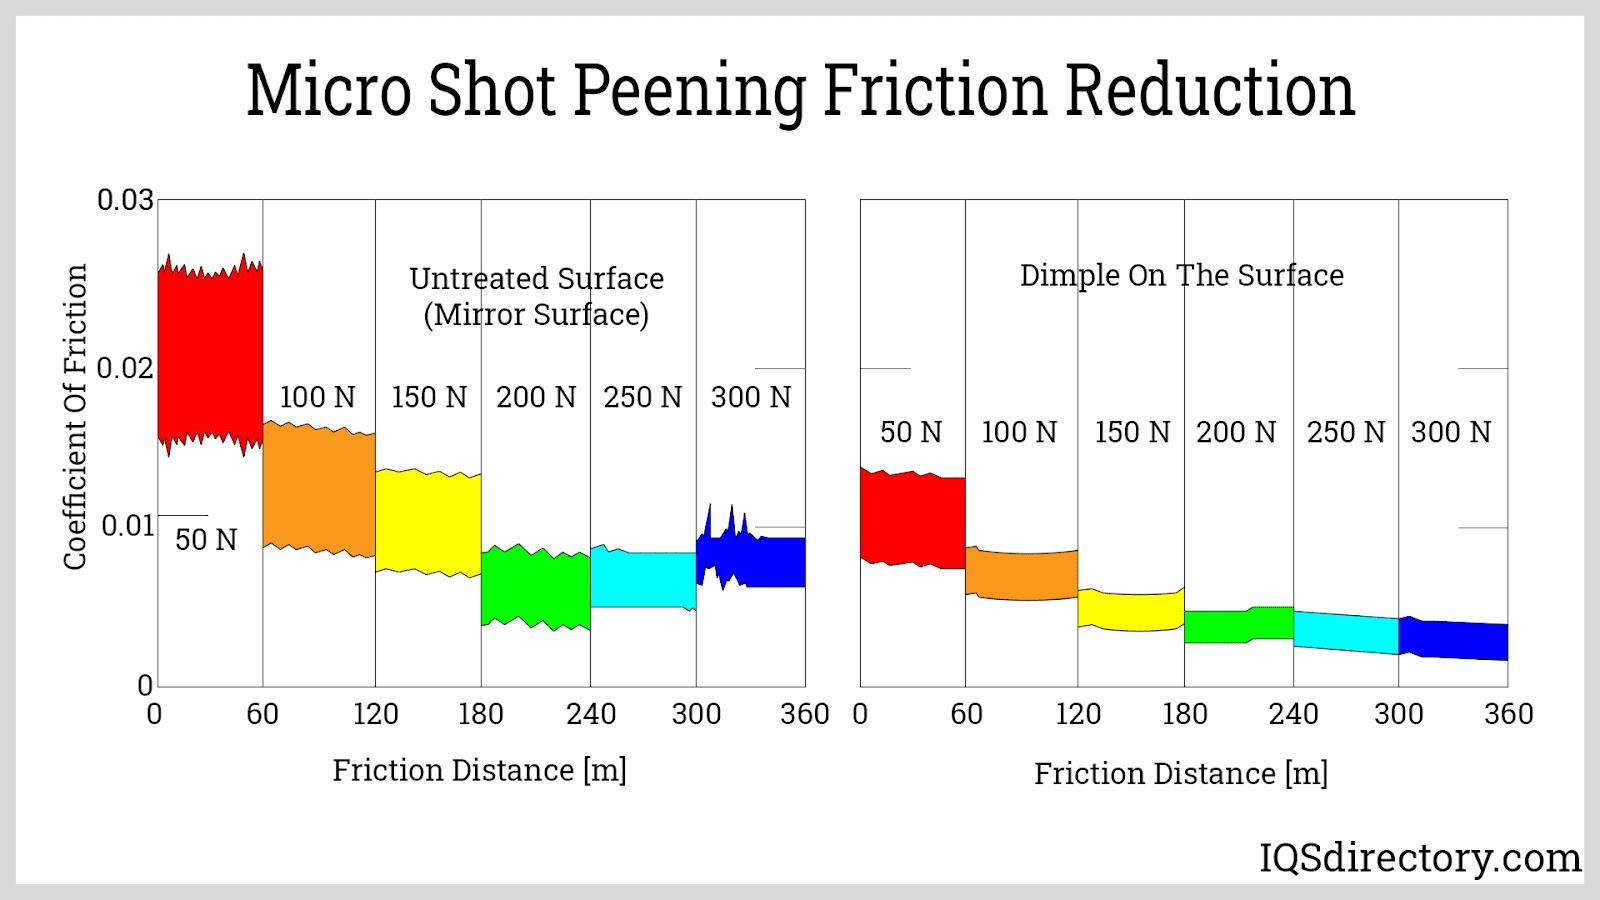 Micro Shot Peening Friction Reduction